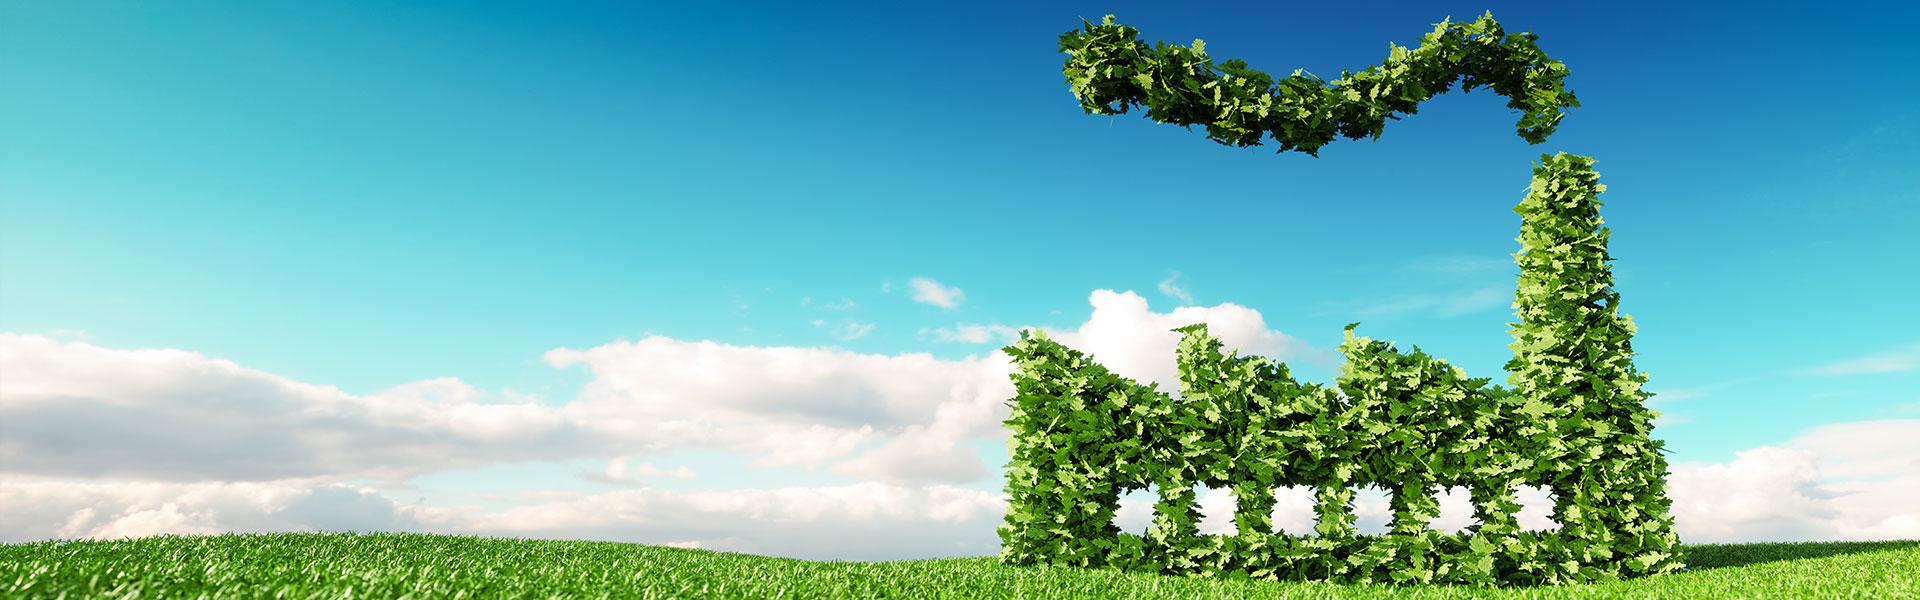 banner-environmental-policy-289-9caefe77bf00b47805f8c28521876539.jpg